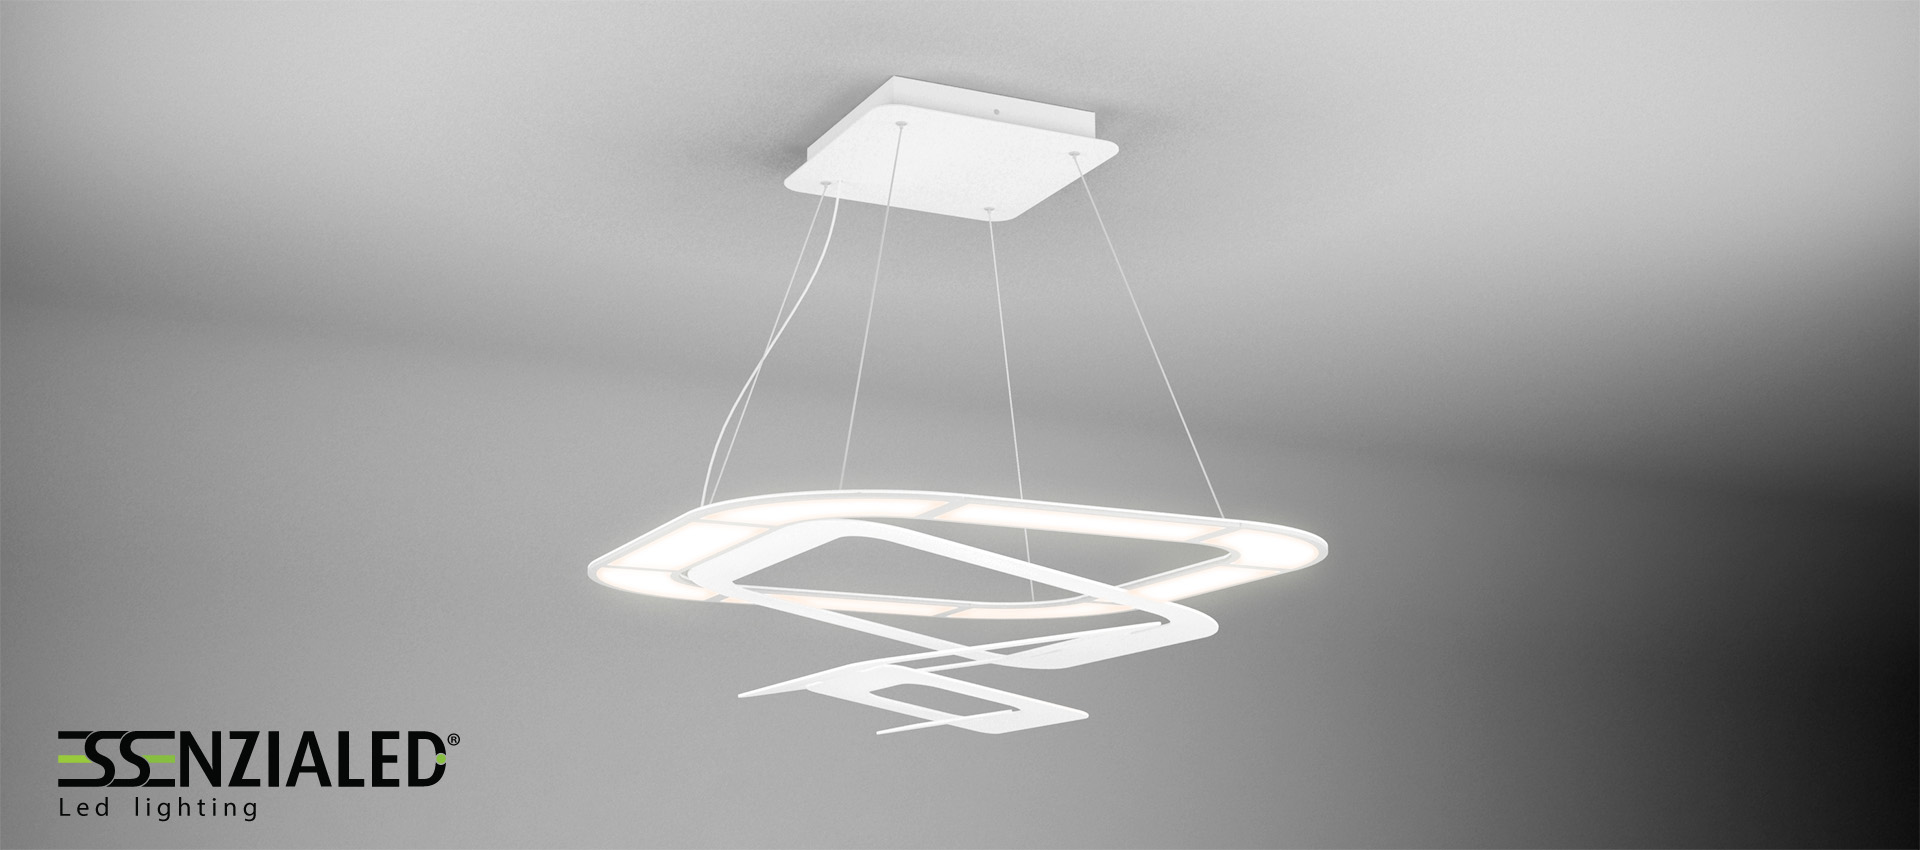 Lampada a sospensione ledessenzialed illuminazione a led for Luce da tavolo